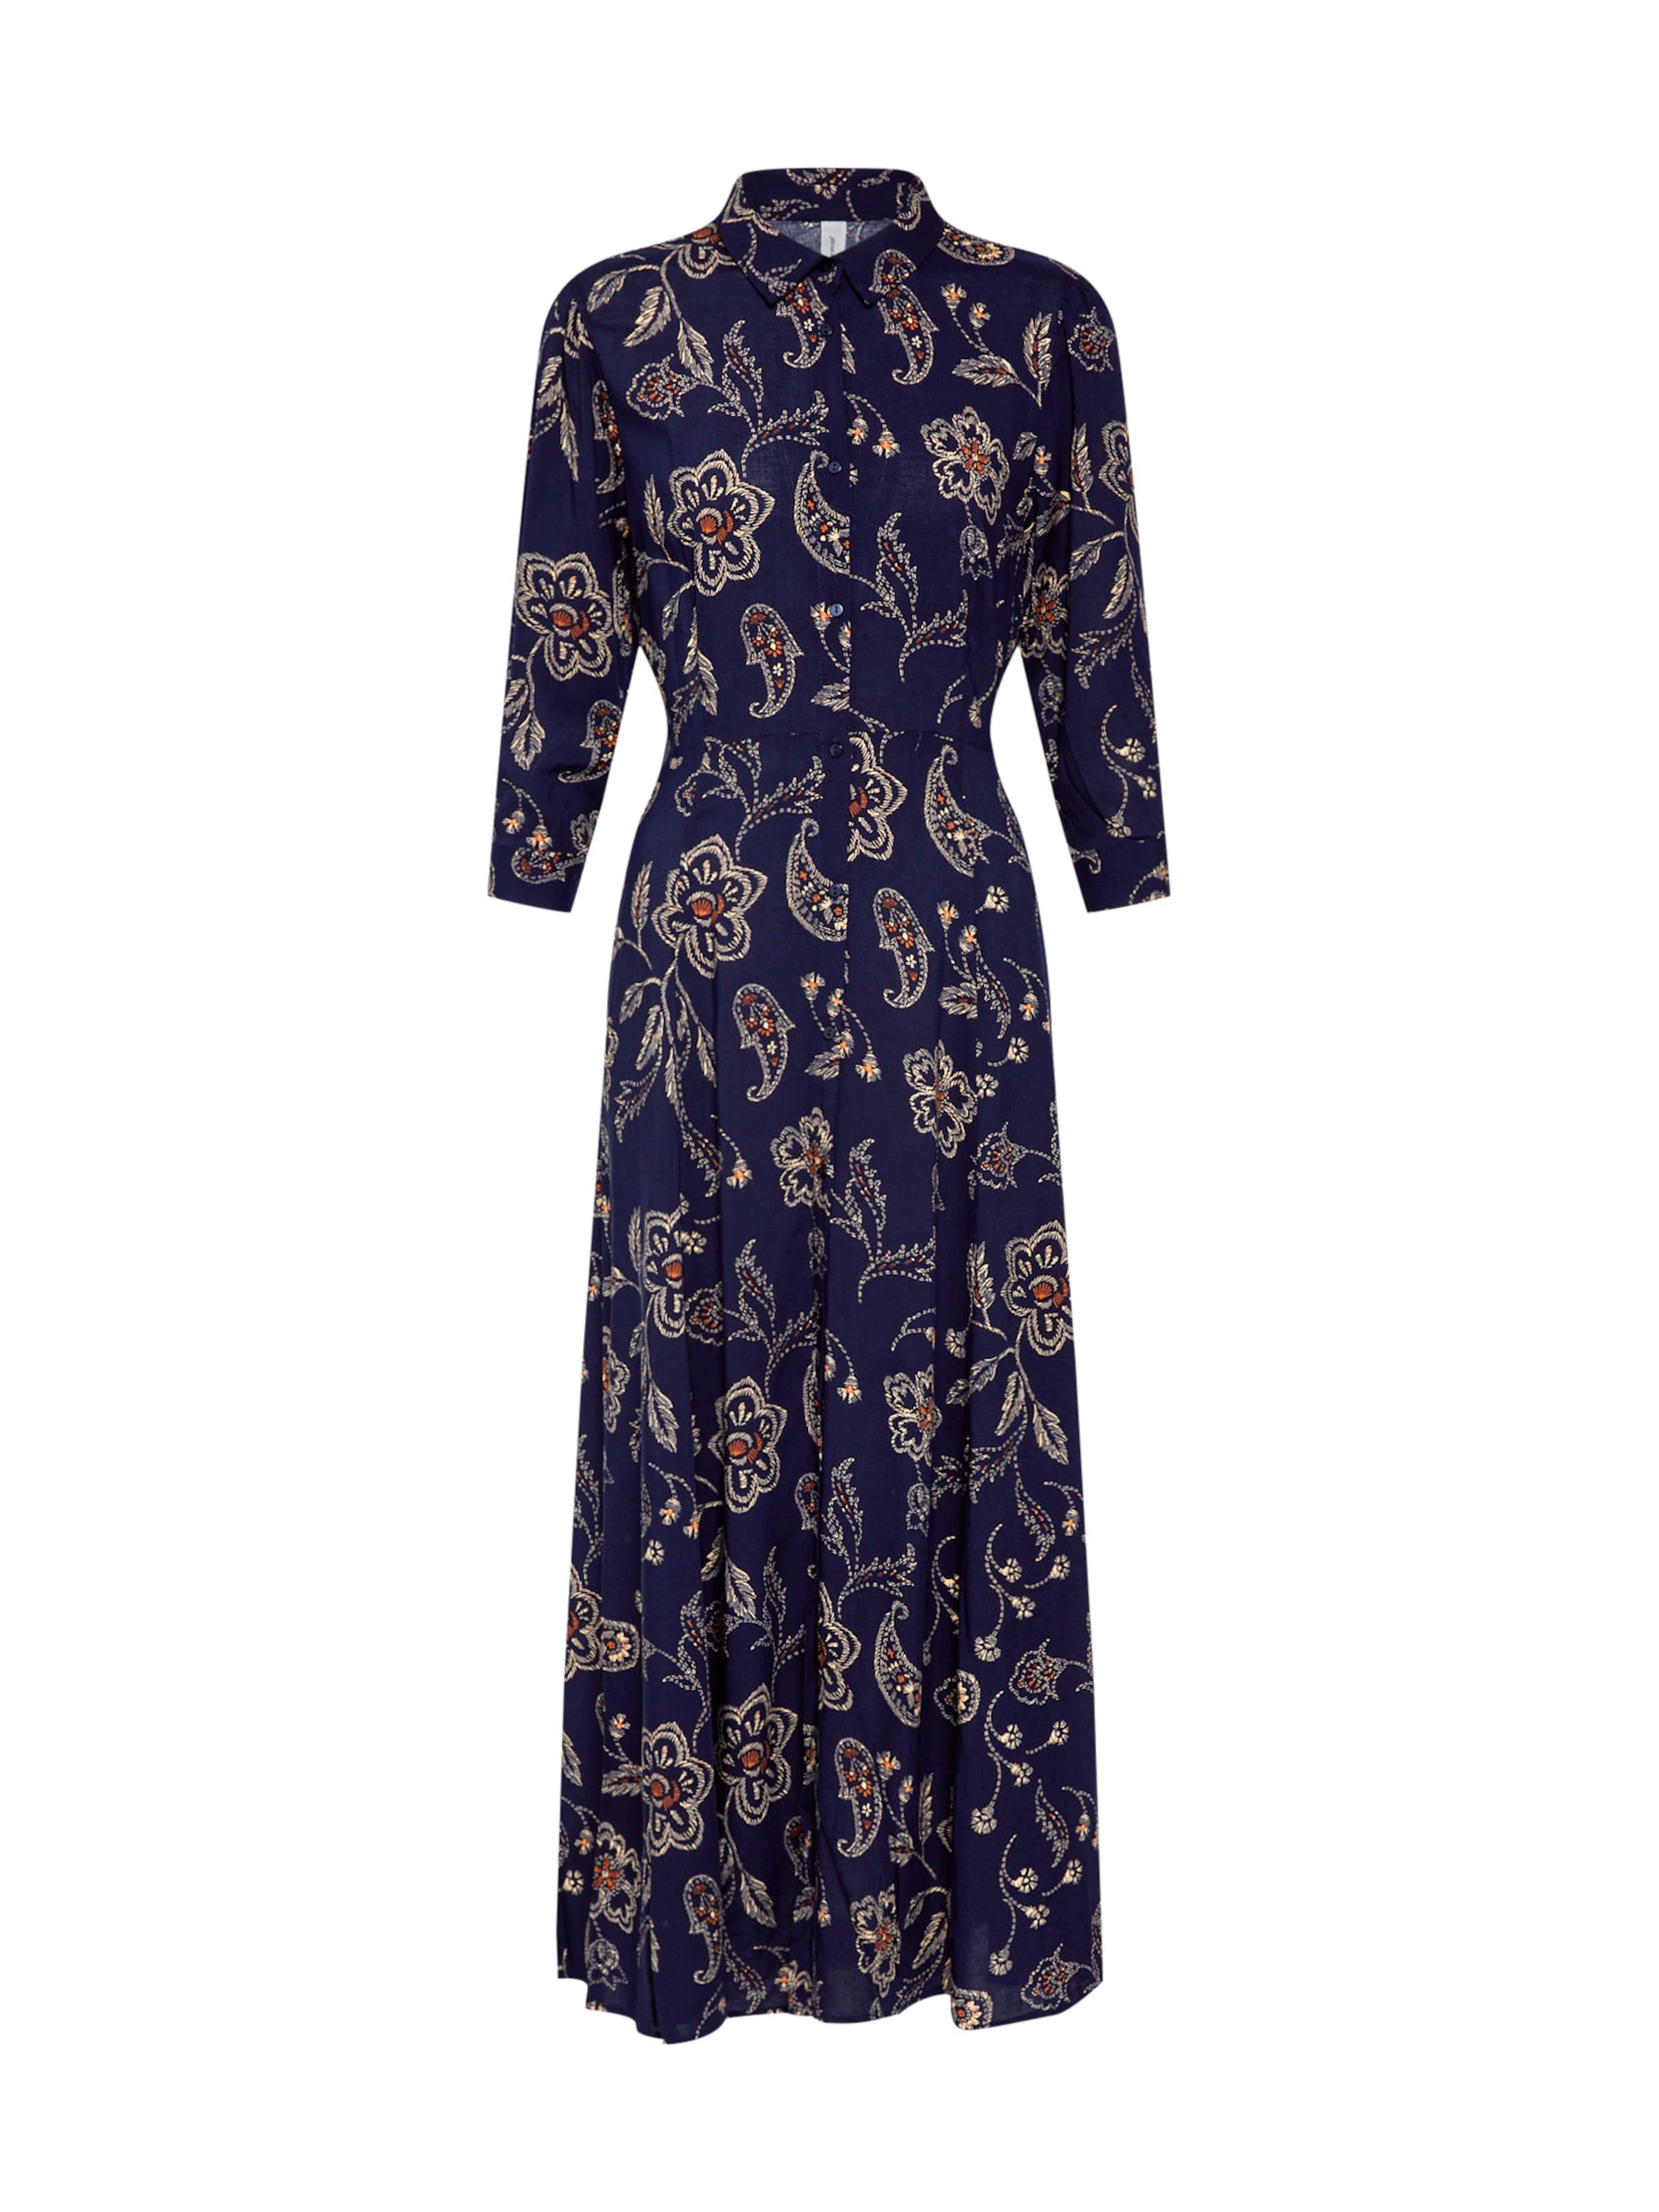 Bleu MarineMélange Soyaconcept Couleurs chemise 3' De Robe 'bonna En OkZw8n0PXN